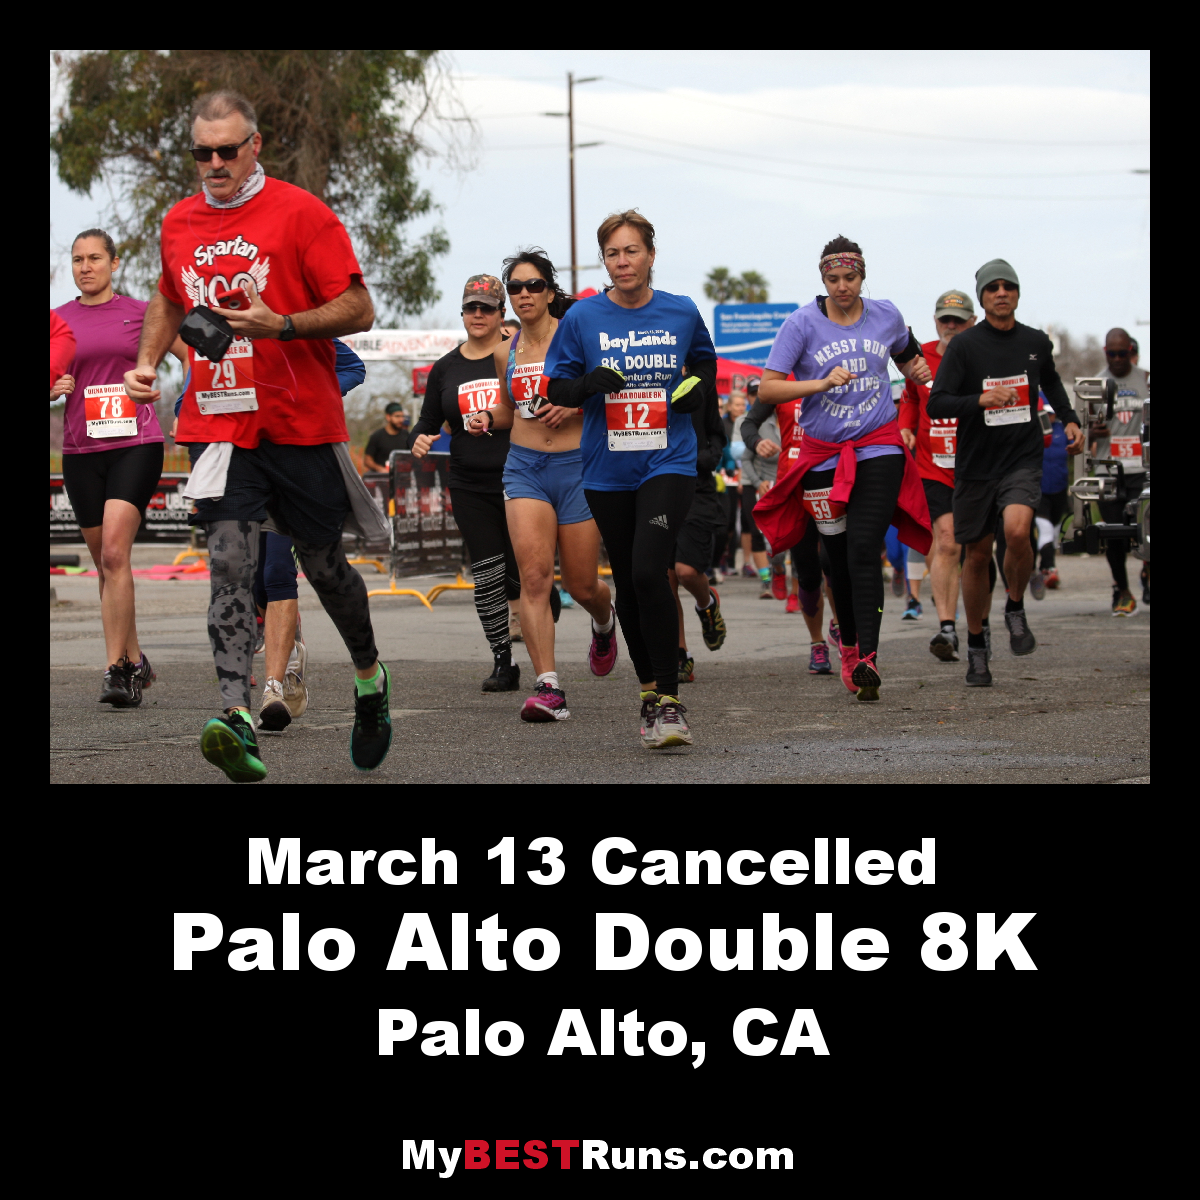 Palo Alto 10K, 5K, Double 8K